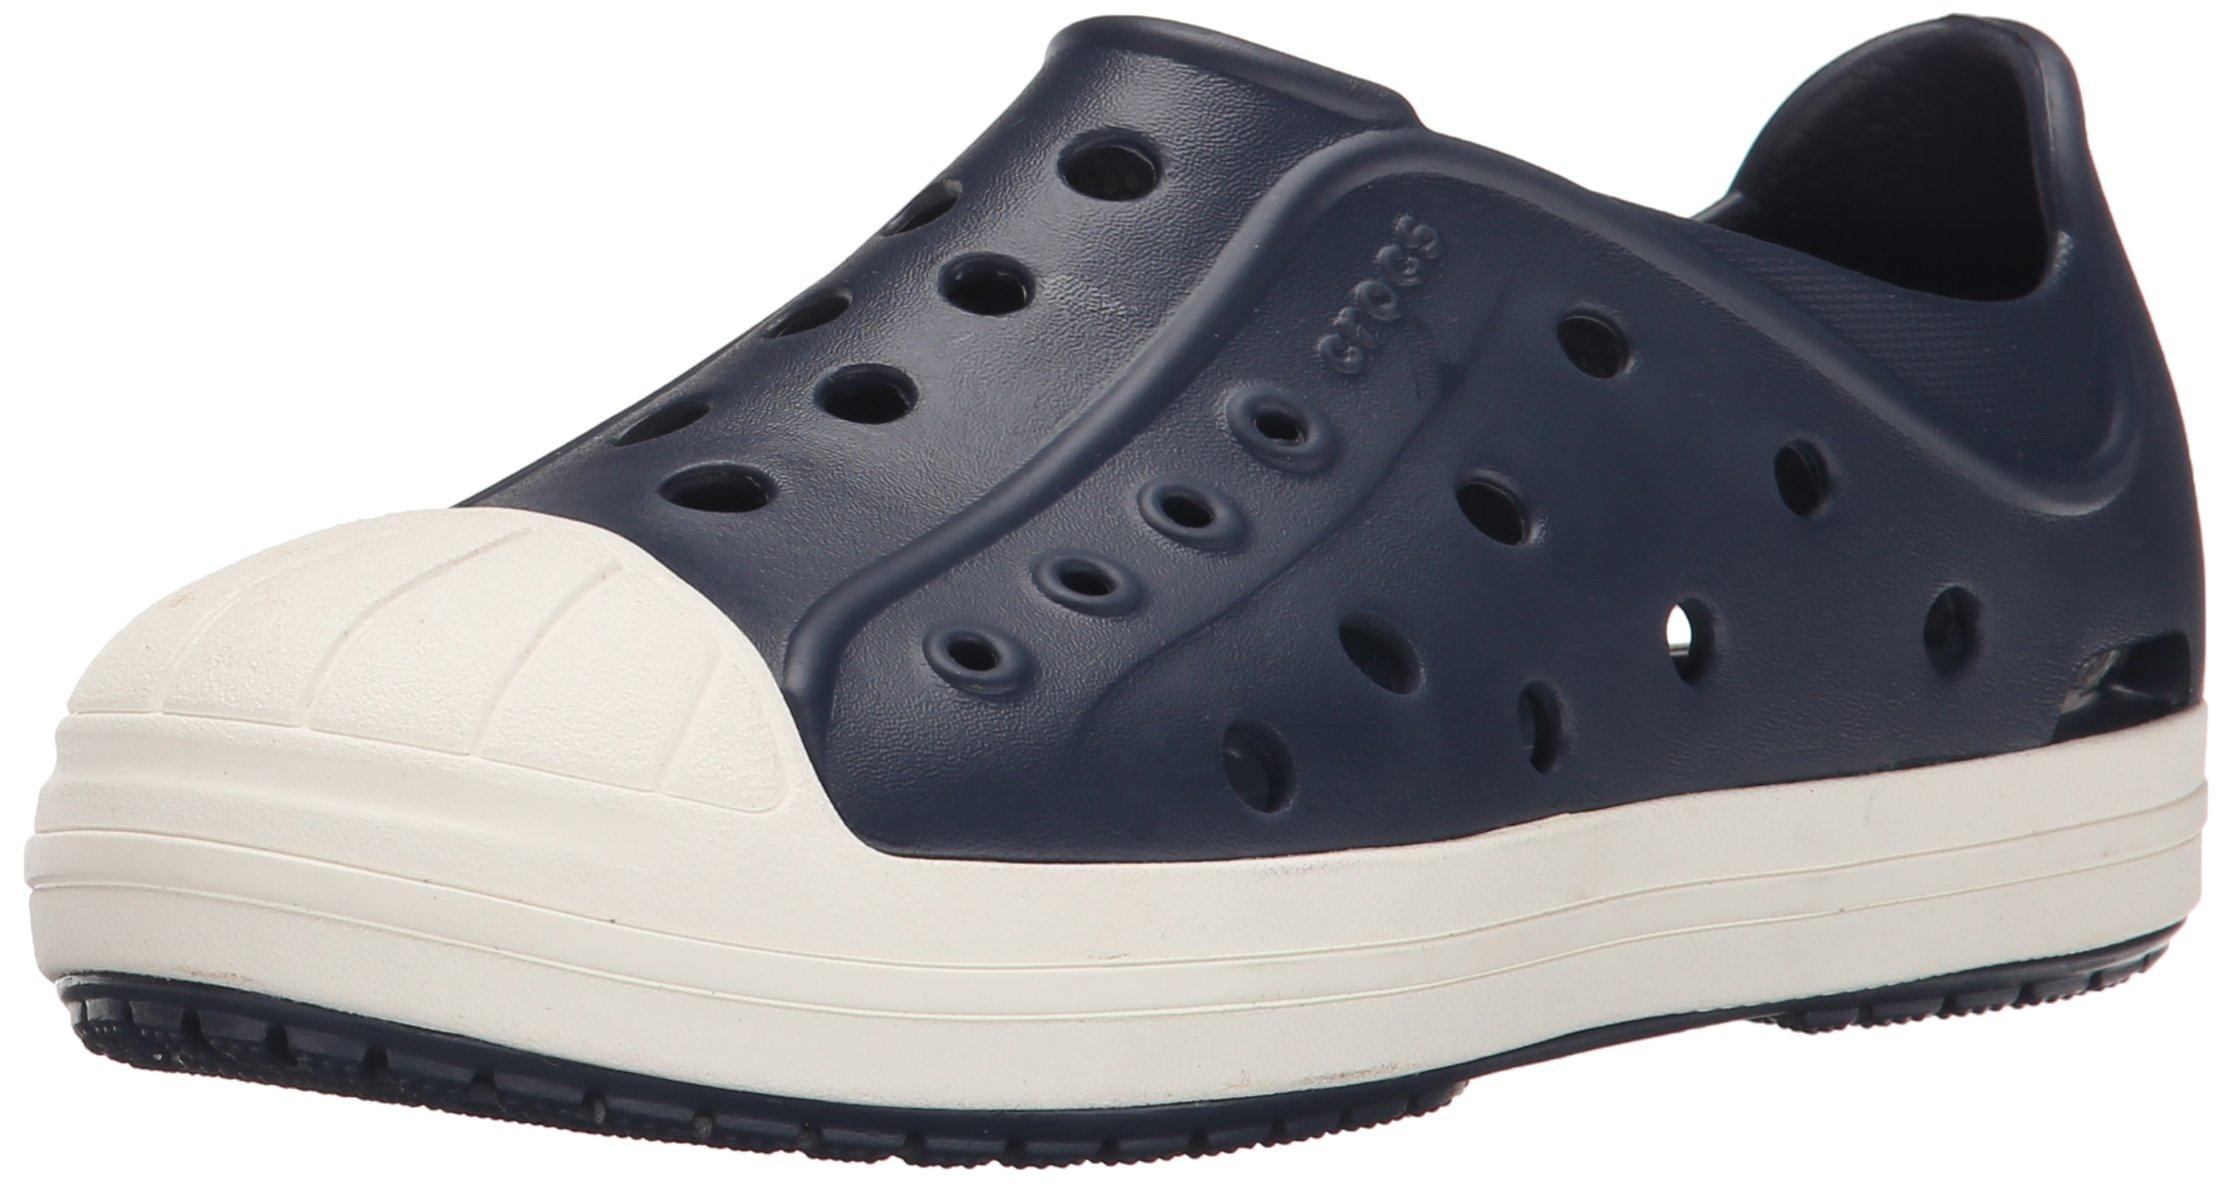 crocs Bump It Shoe Slip-On Shoe (Toddler/Little Kid), Navy/Oyster, 6 M US Toddler by Crocs